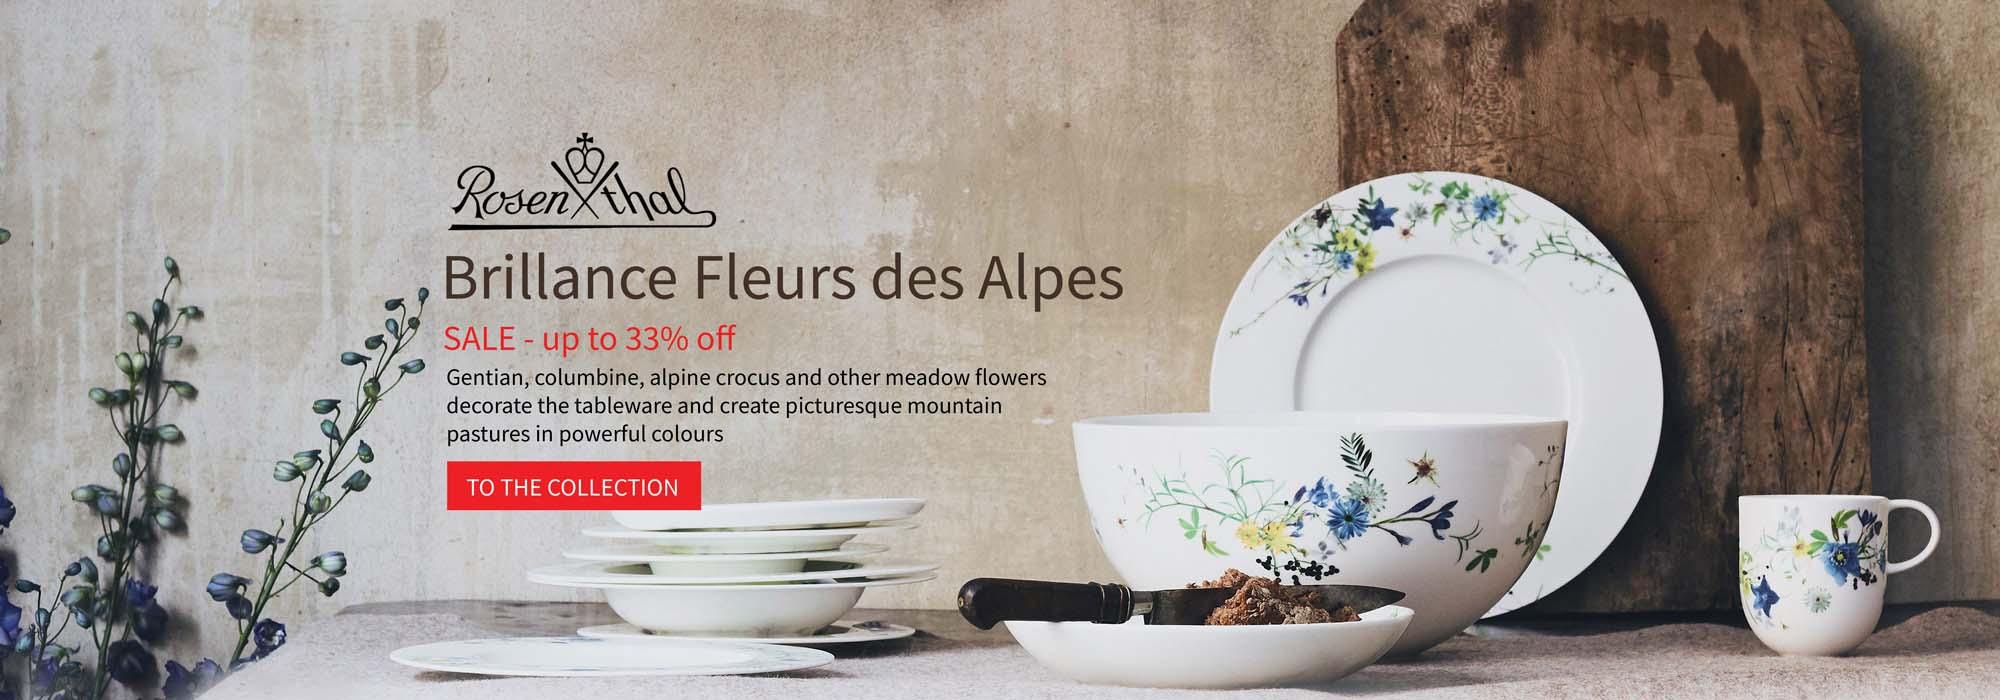 Rosenthal Selection Brillance Fleurs des Alpes